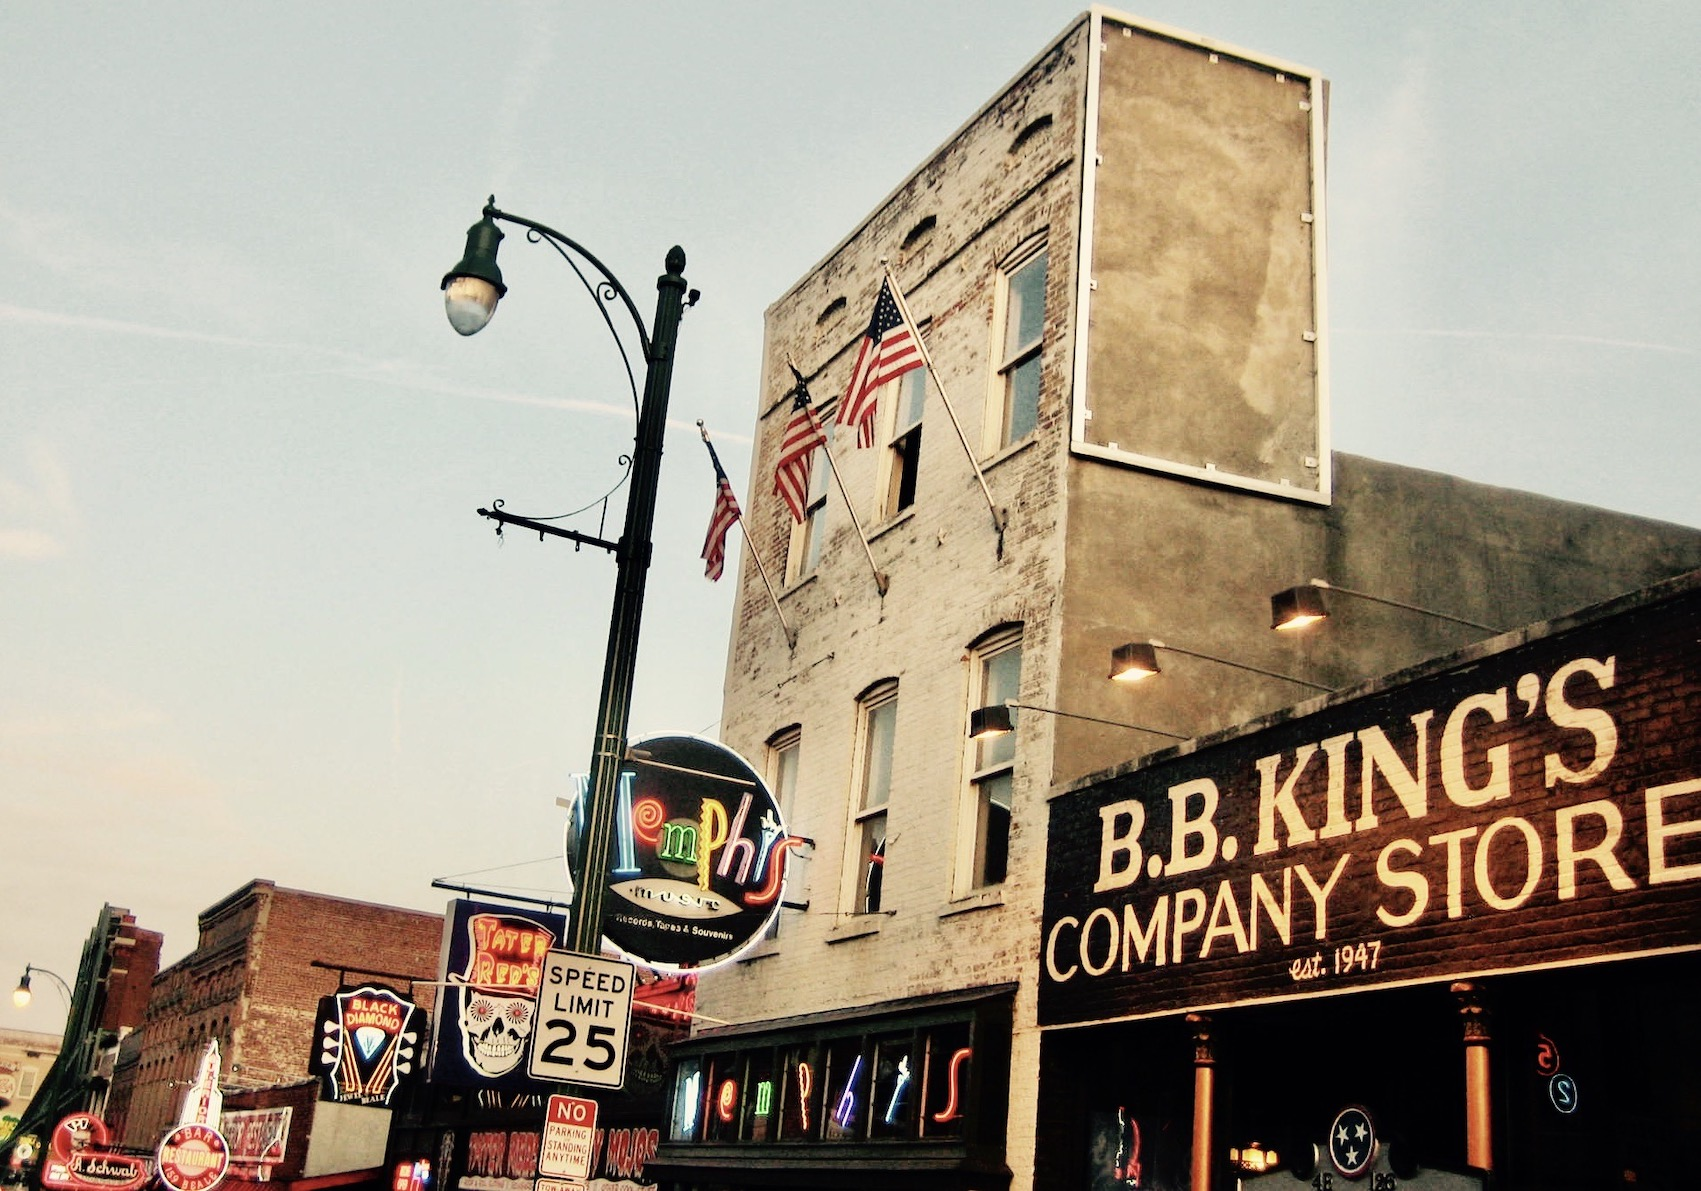 B.B. King's Company Store Beale Street Memphis